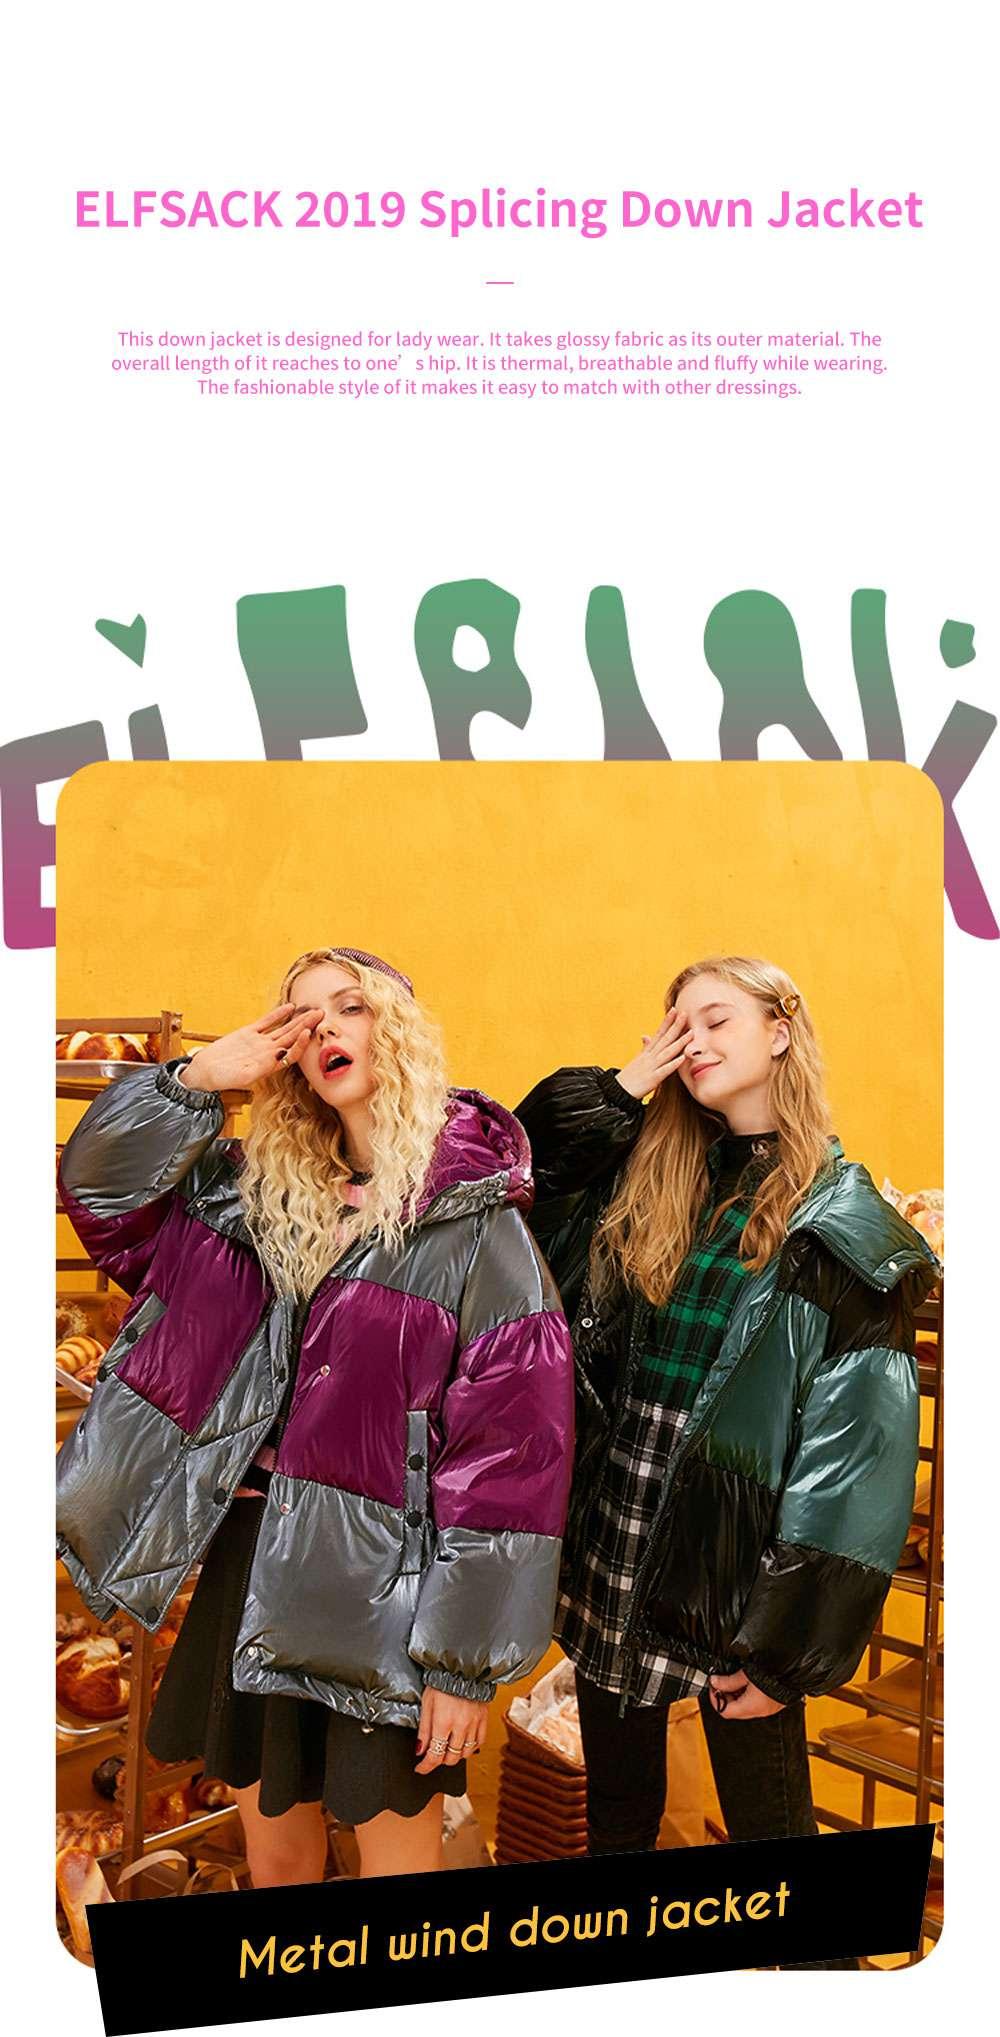 ELFSACK 2019 NEW Splicing Glossy Down Jacket for Women Winter Wear Loose Down Coat Fashion Down Jacket 0